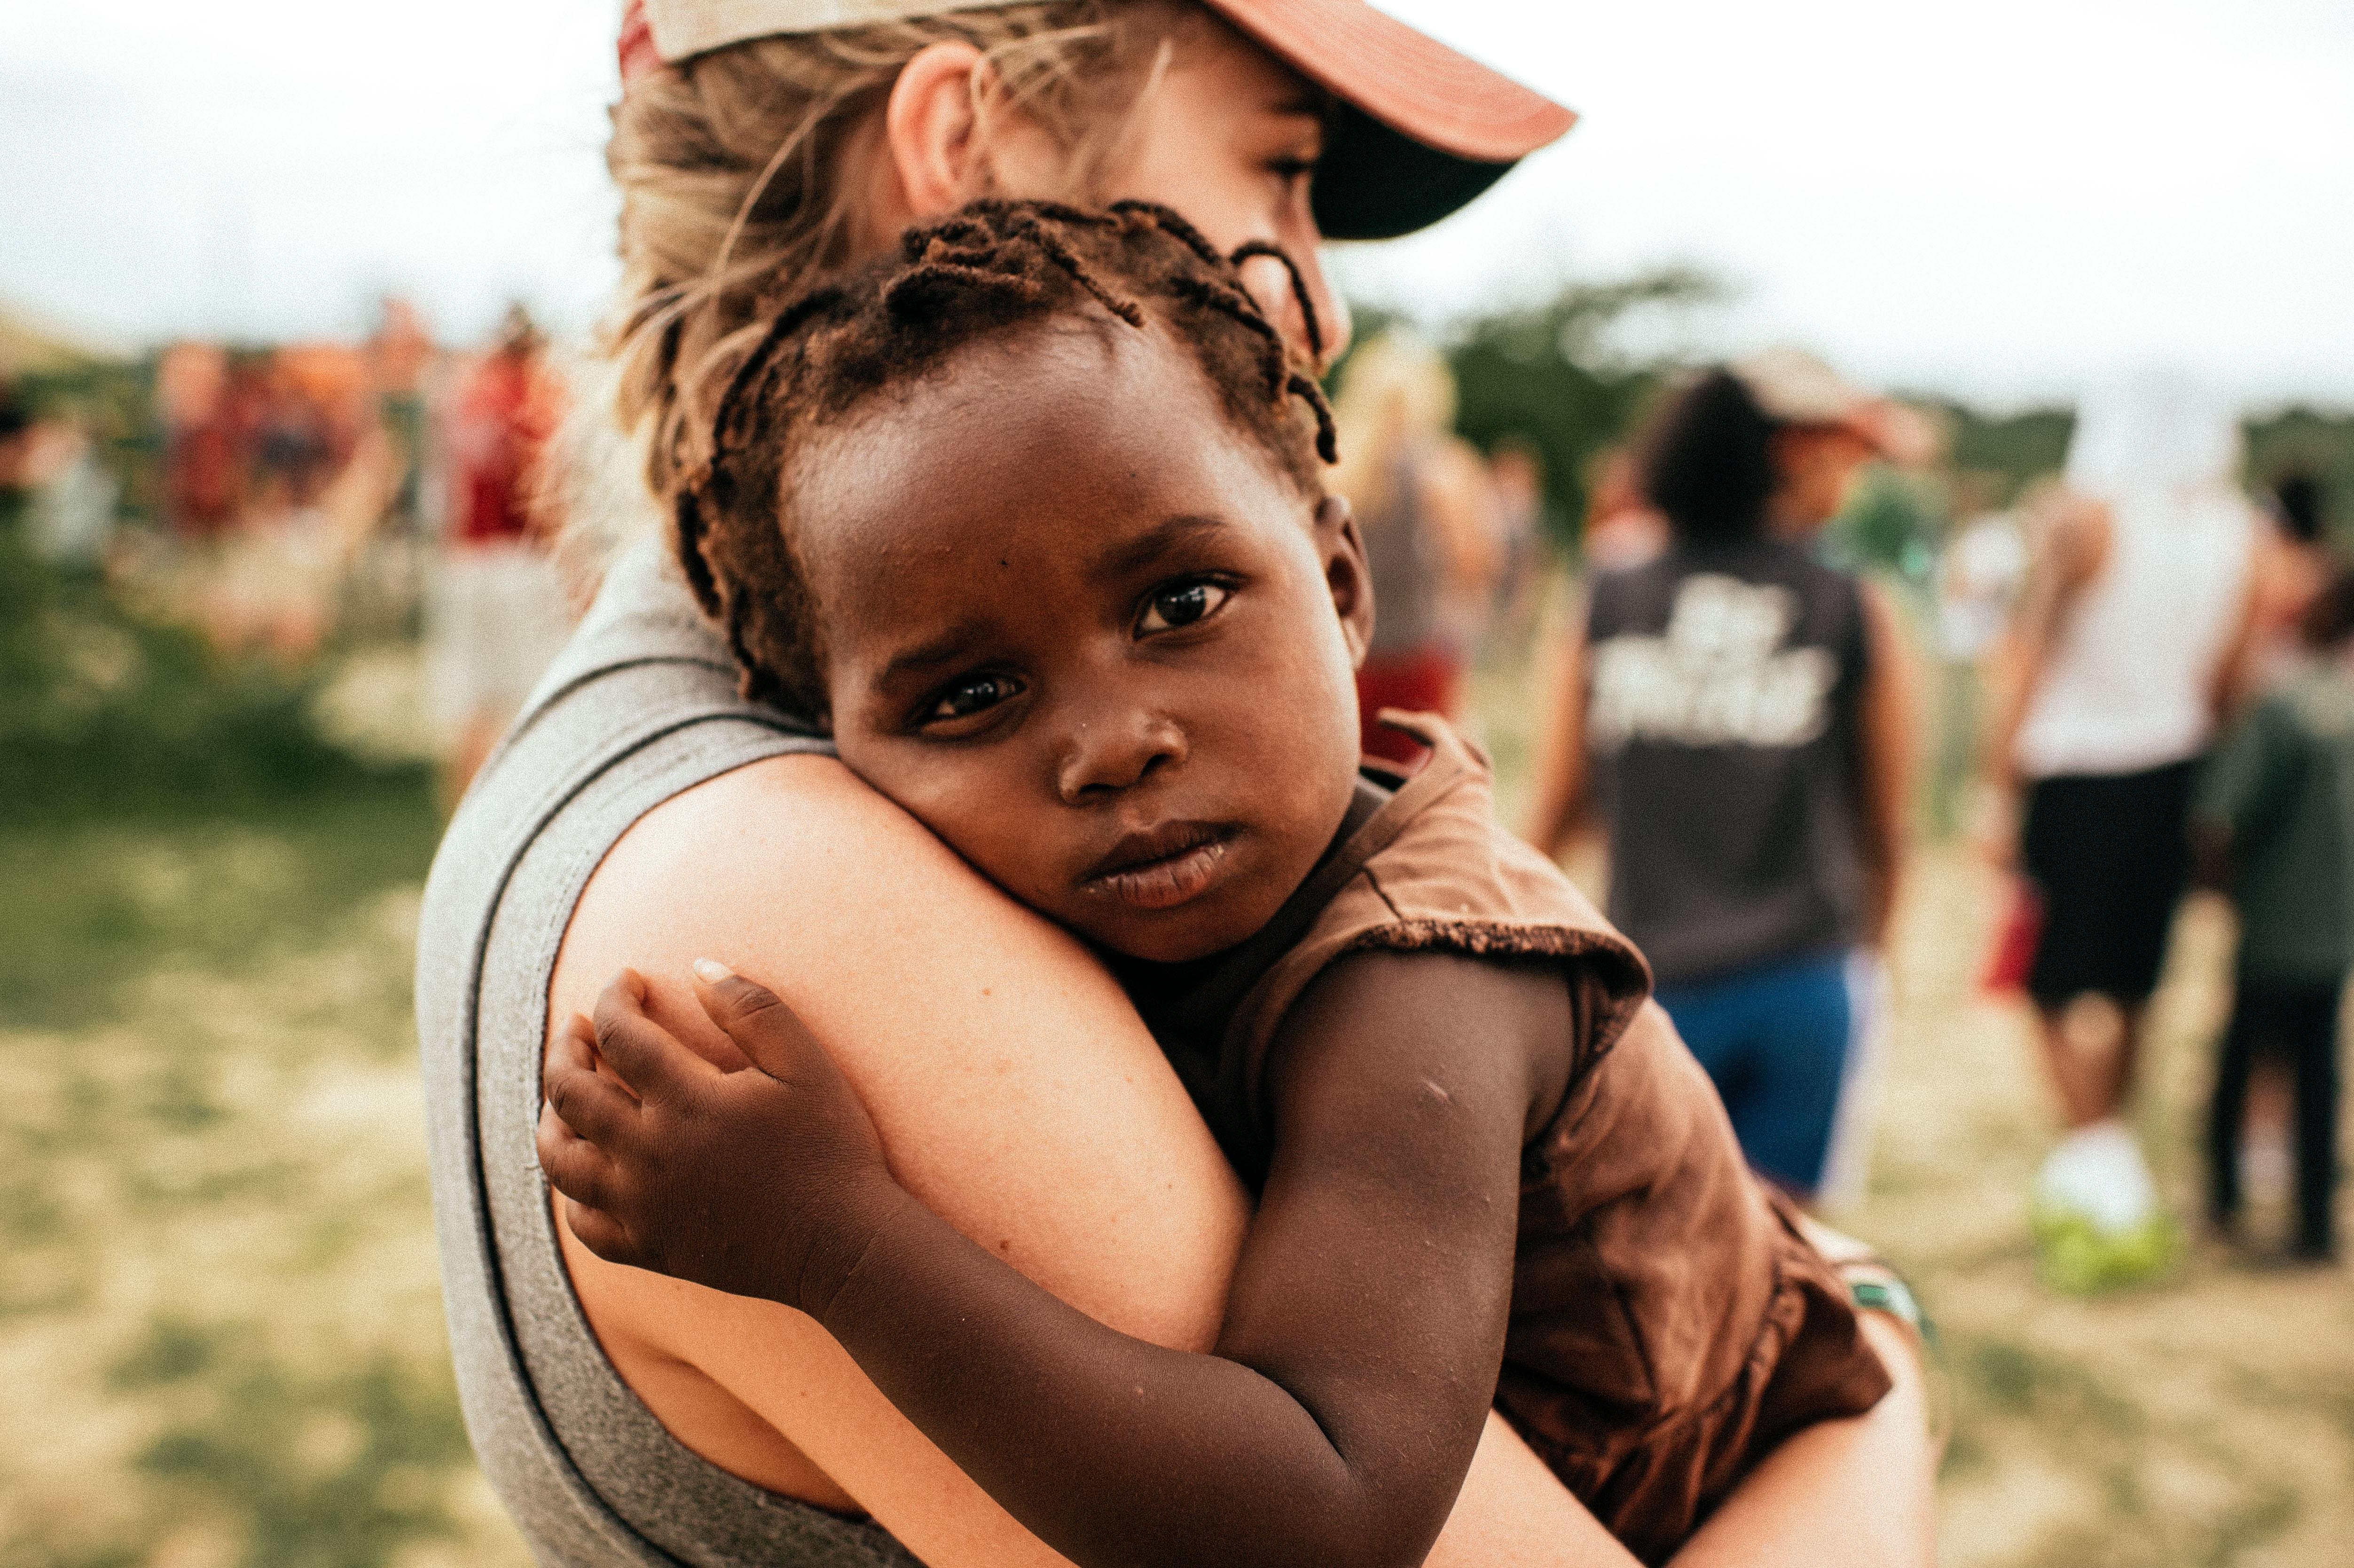 Photo of La onlus Aspic cerca un medico volontario per una missione in Burkina Faso